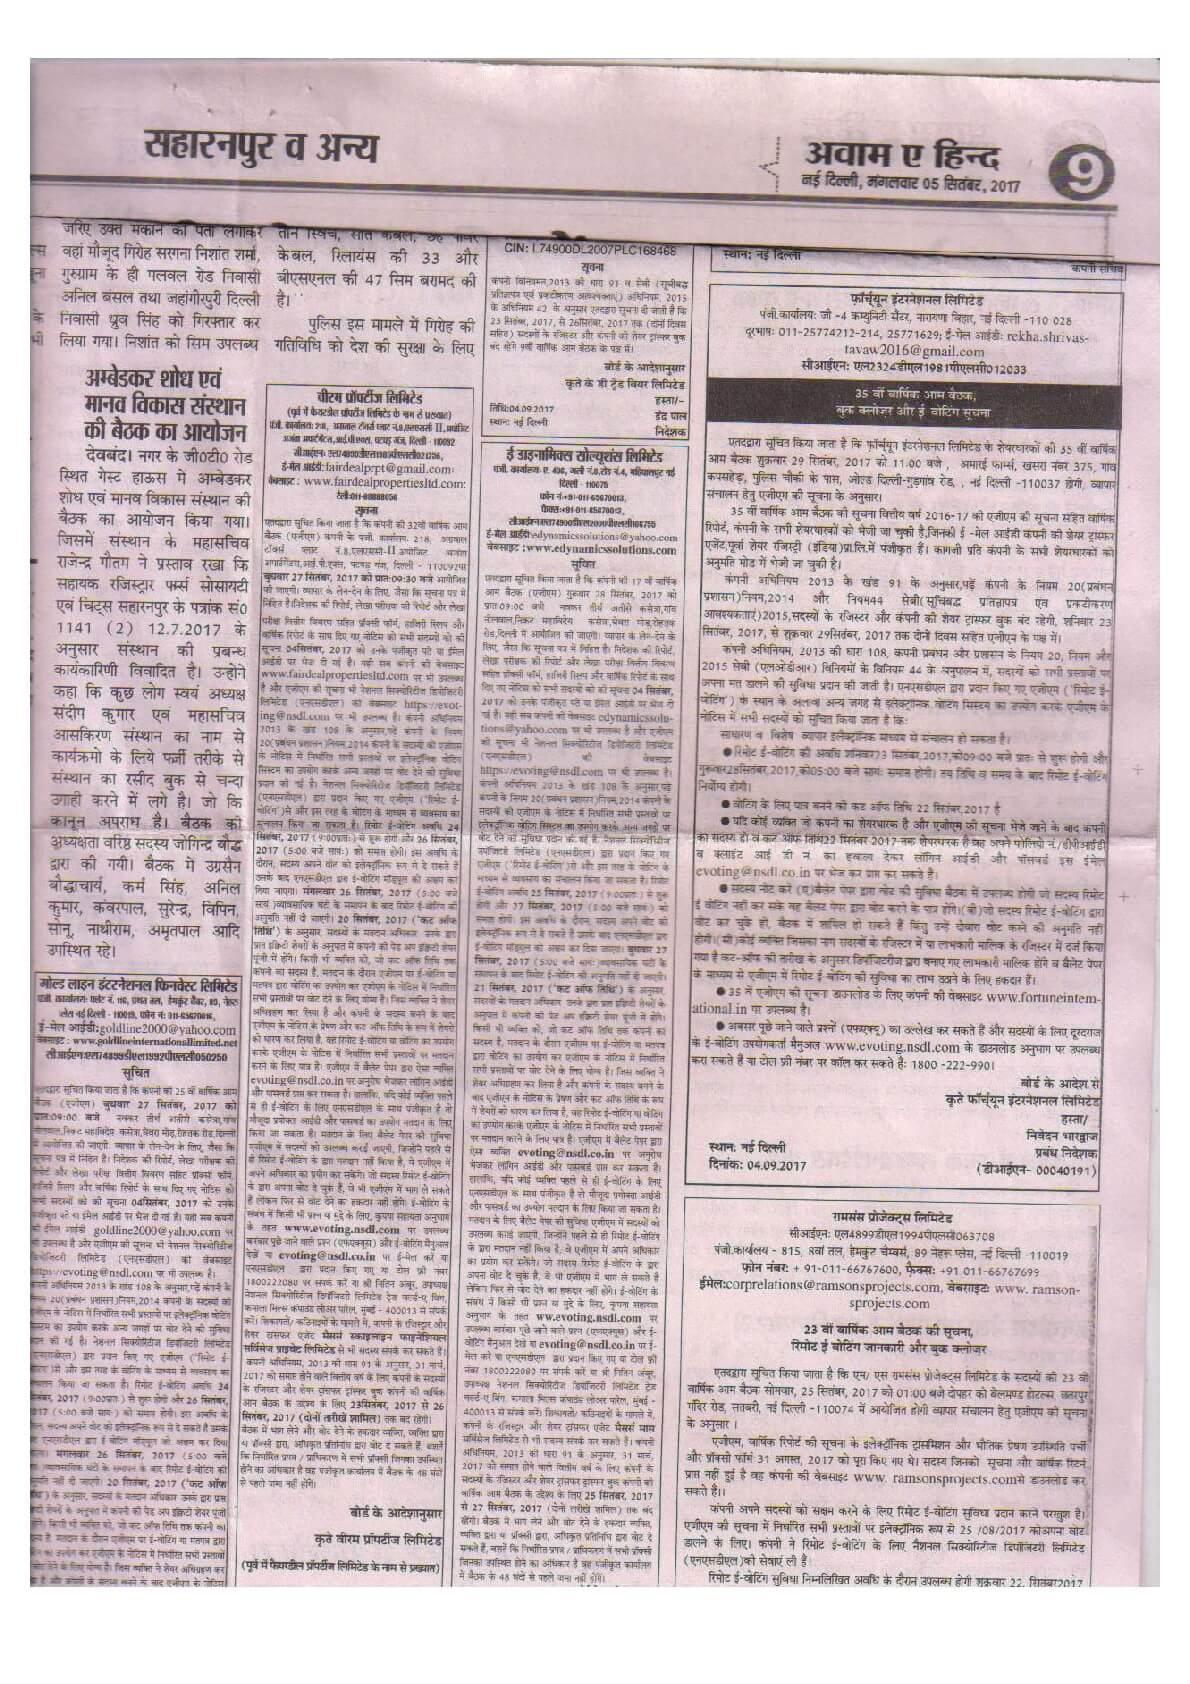 AGM Newspaper cutting-Hindi-2017